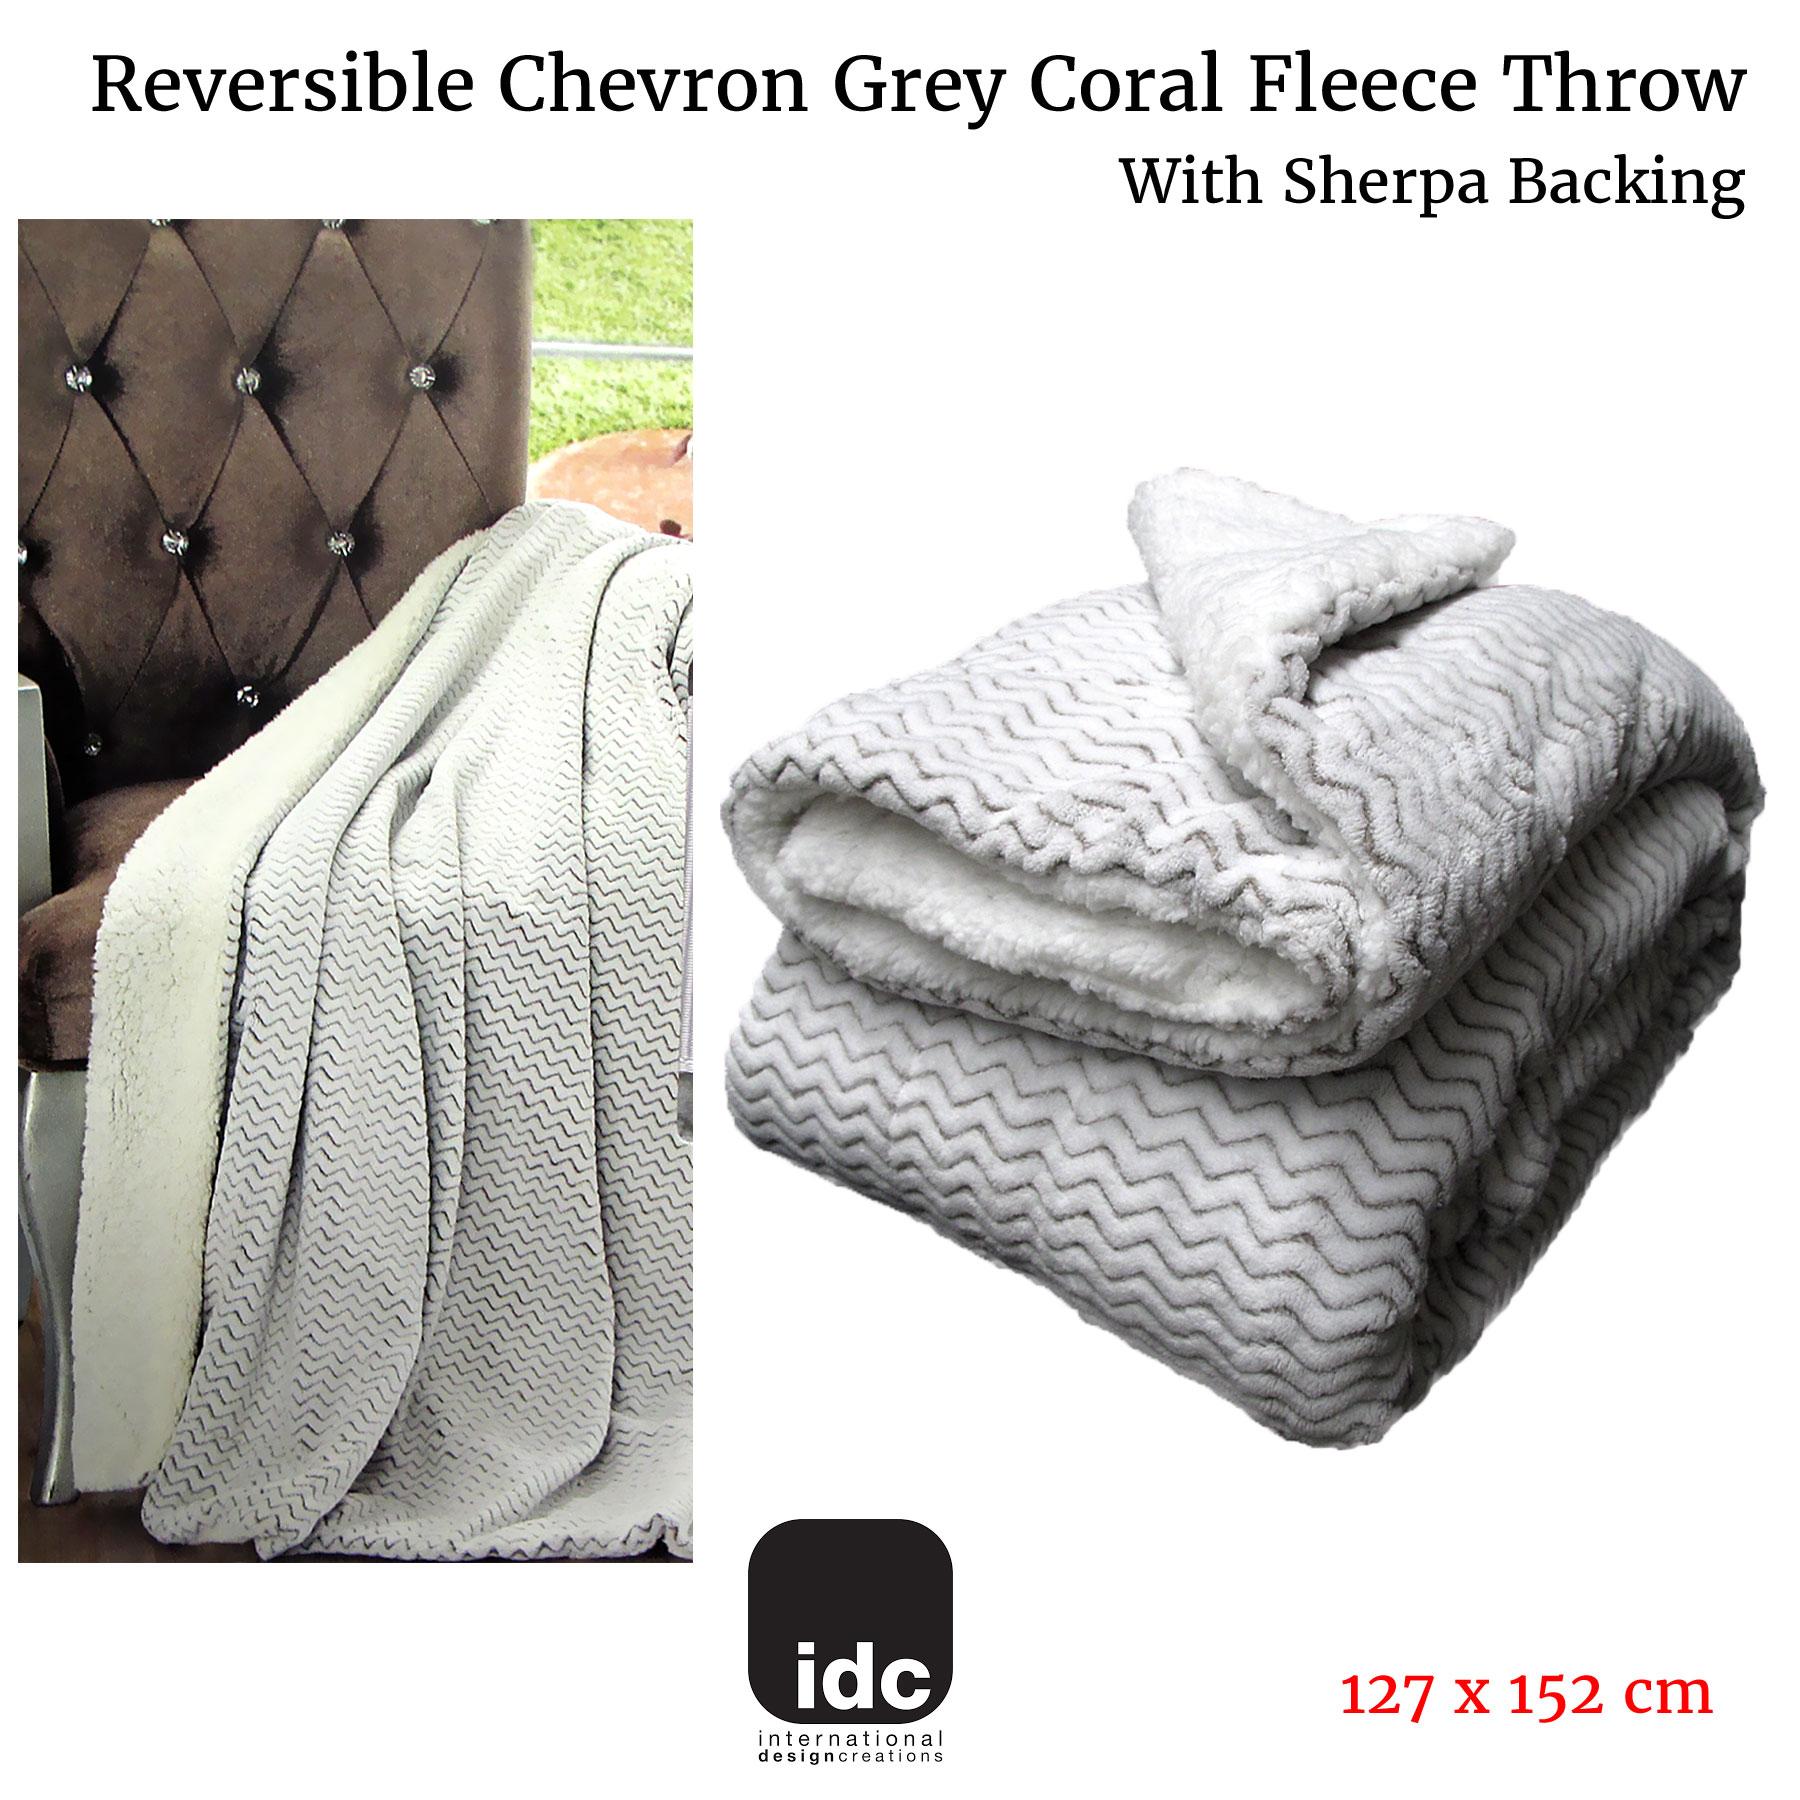 Reversible Chevron Grey Coral Fleece Sofa Lounge Throw with Sherpa ...